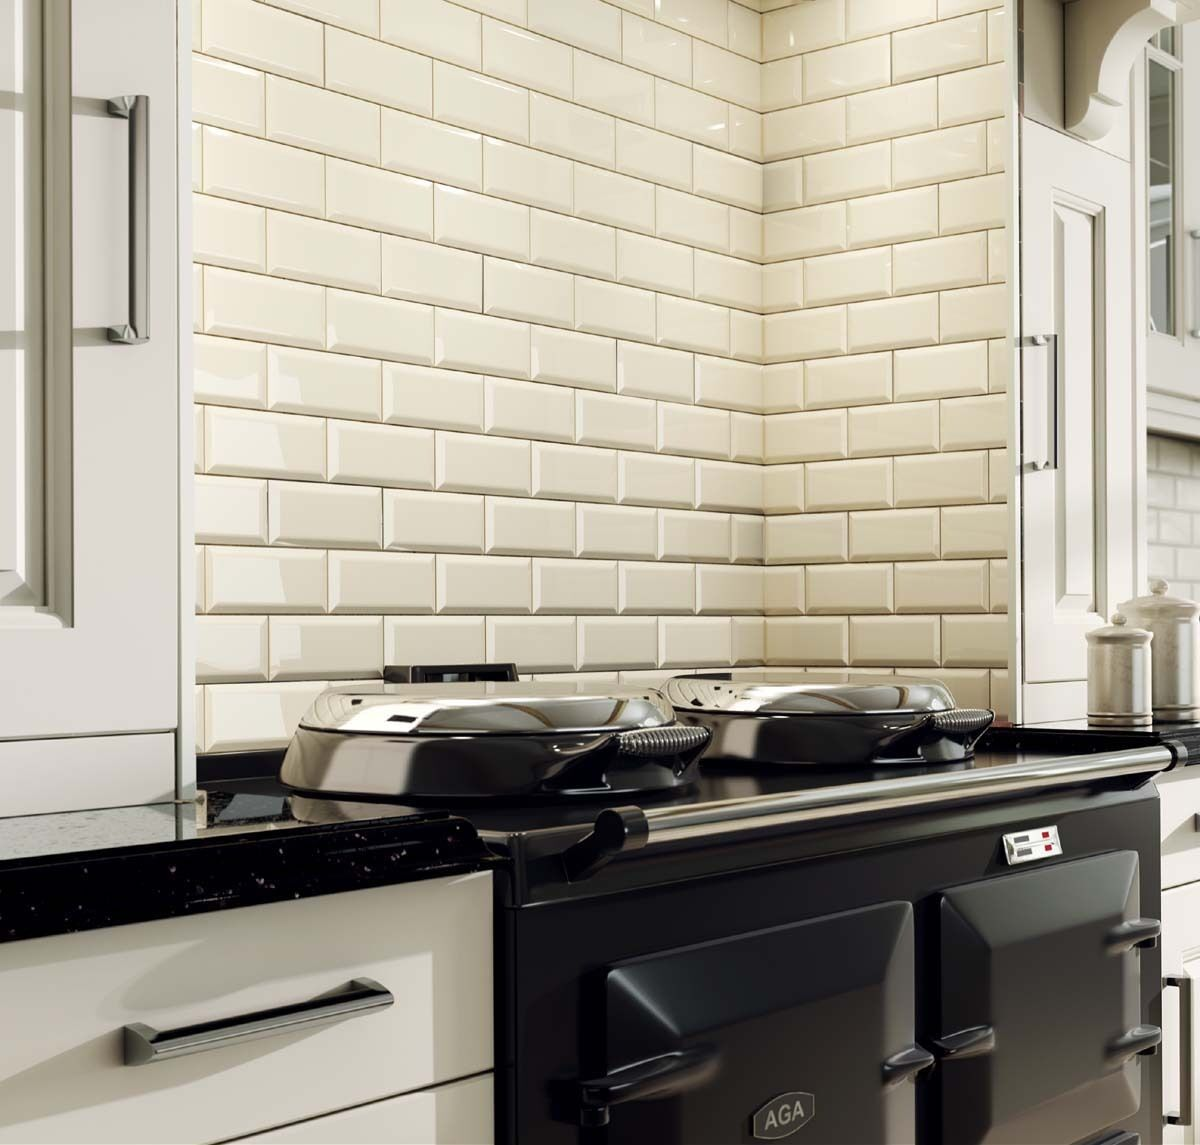 Cream Gloss Kitchen Wall Tiles: Metro 20x10cm Cream Gloss Beveled Edge Tiles (1 Box/SQM 50